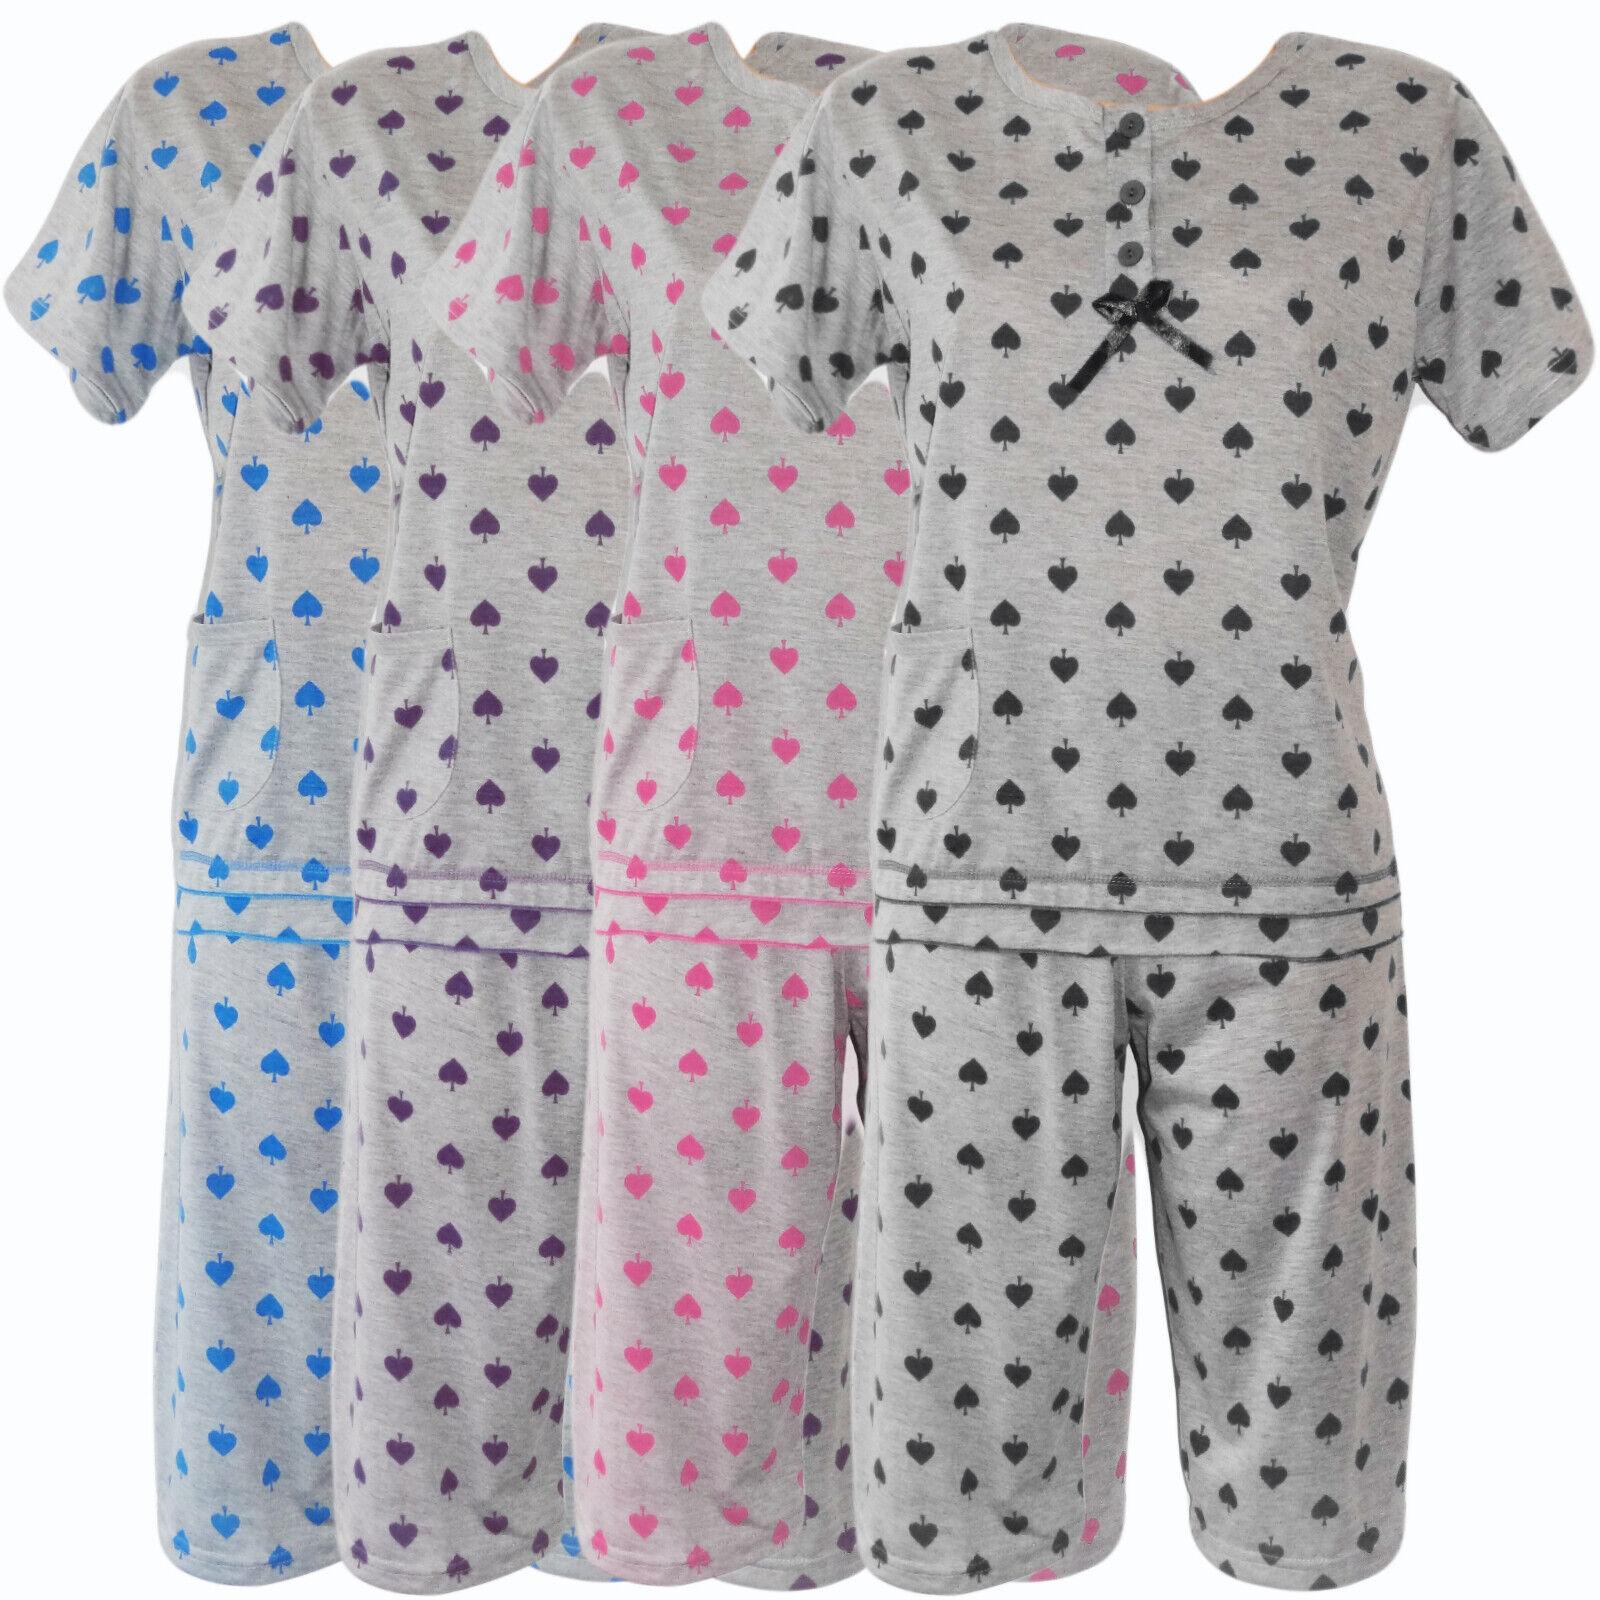 Damen Pyjama Set Capri Hose +T-Shirt Schlafanzug Nachtwäsche Grau 36-46